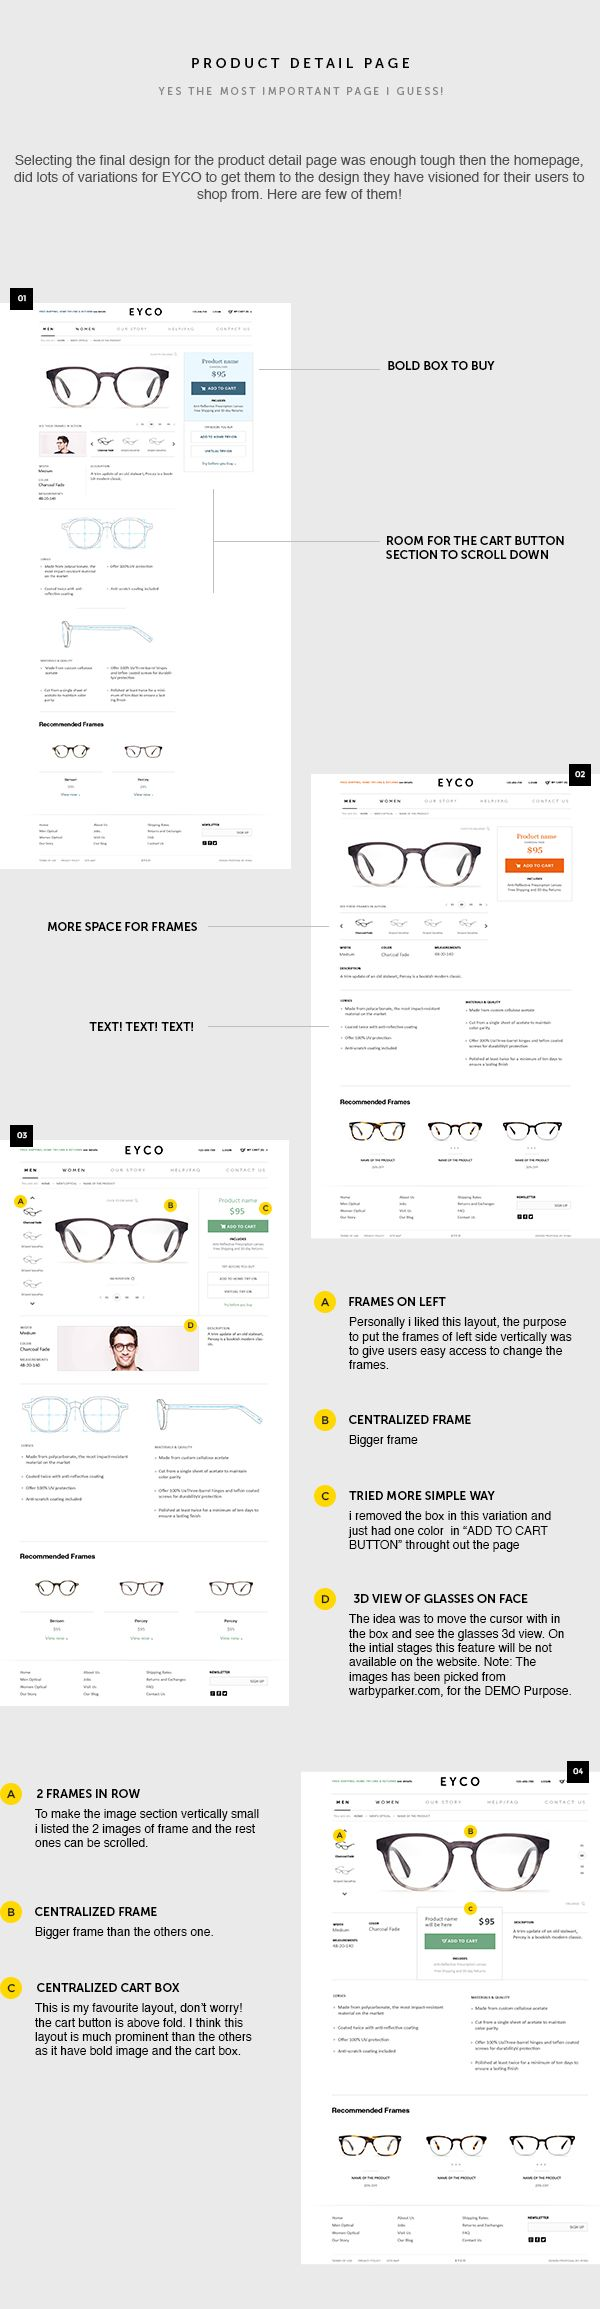 Eyewear Online Store (EYCO) on Web Design Served